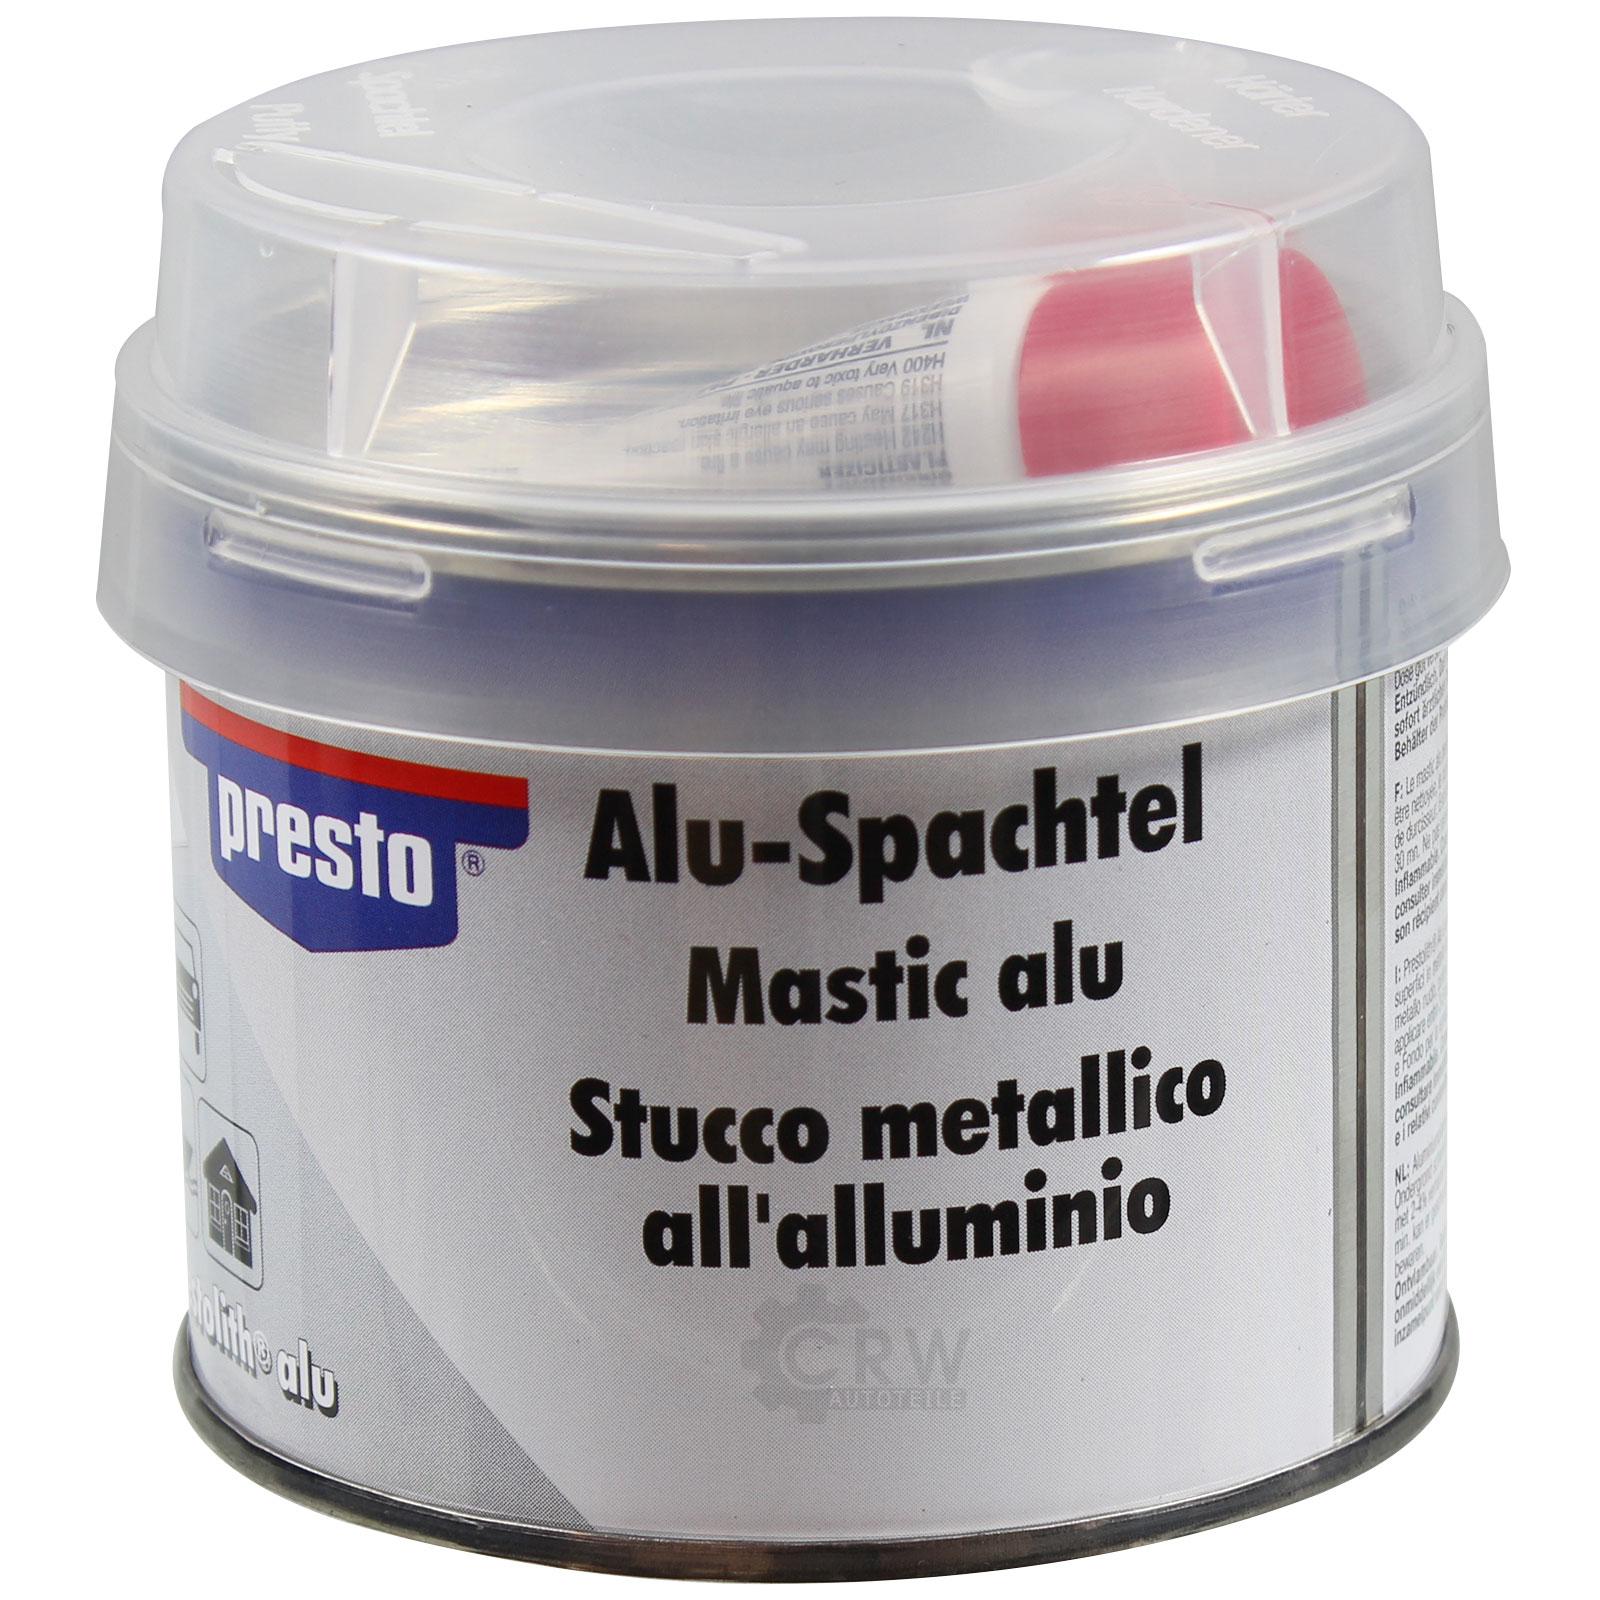 Presto Universal spatola presto Füllspachtel 250g